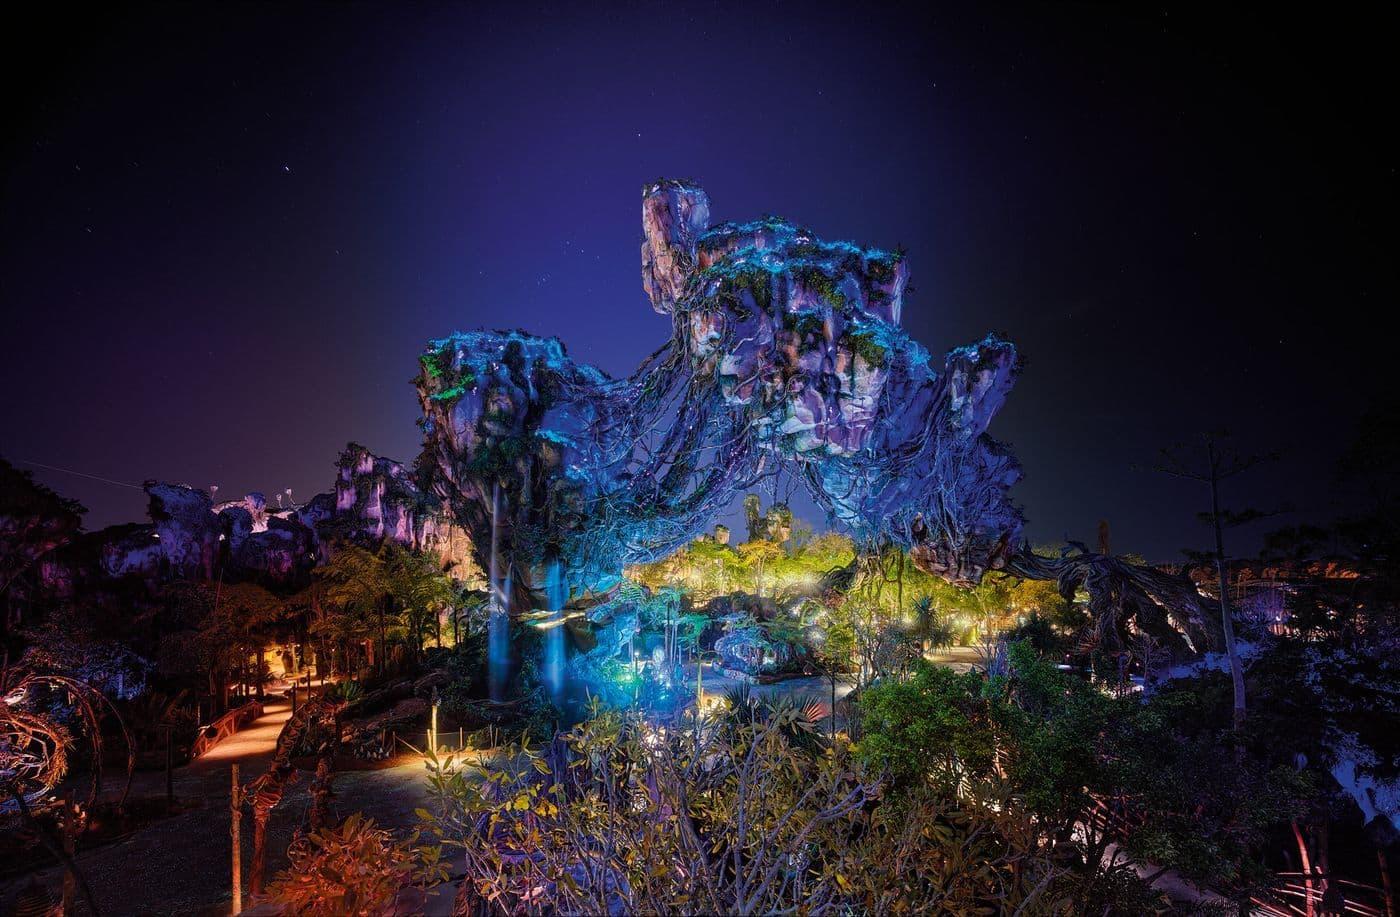 RUMOR - 'Pandora' Expansion Already Planned for Walt Disney World ...